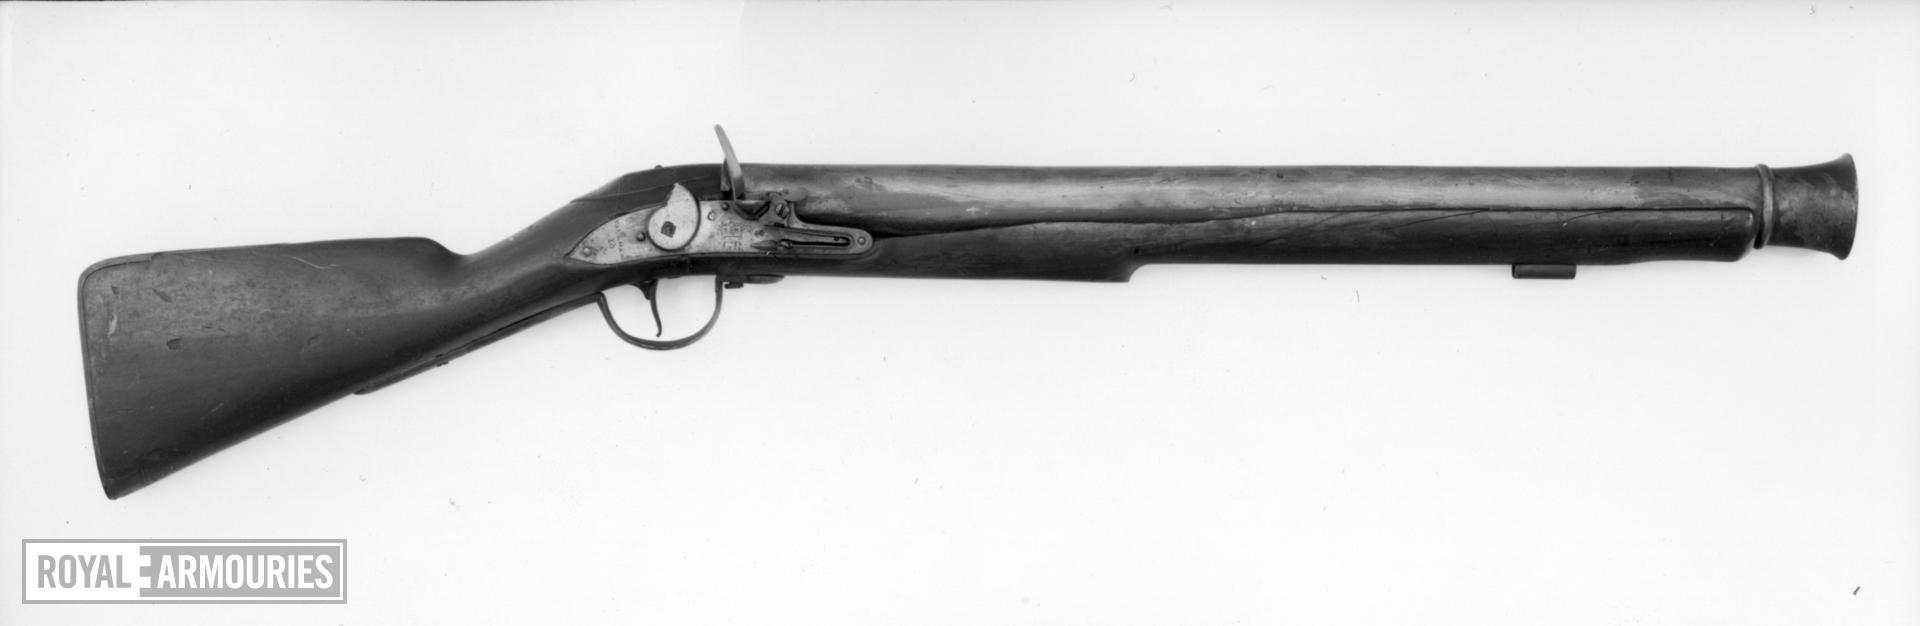 Flintlock military musketoon